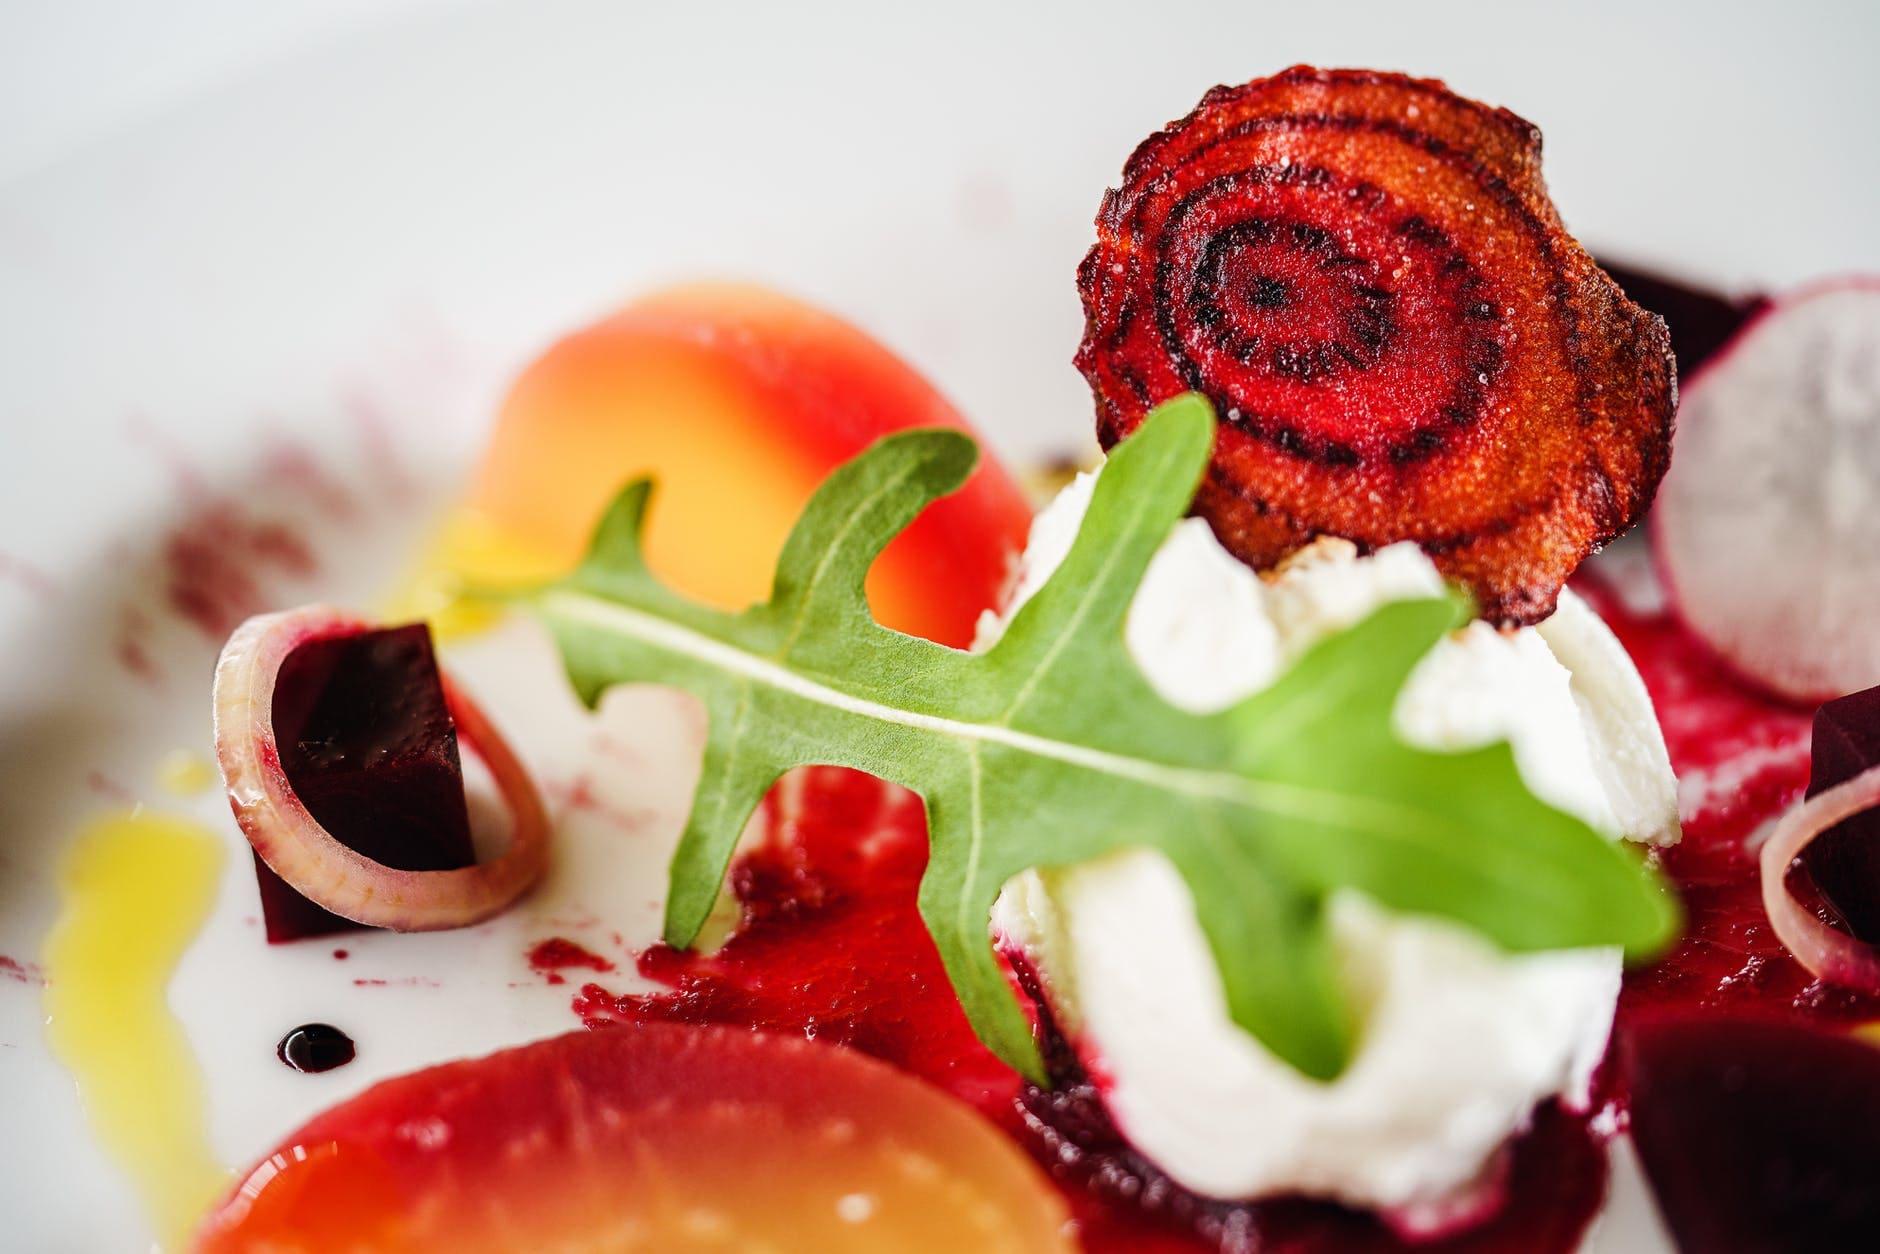 How to make beetroot and arugula salad